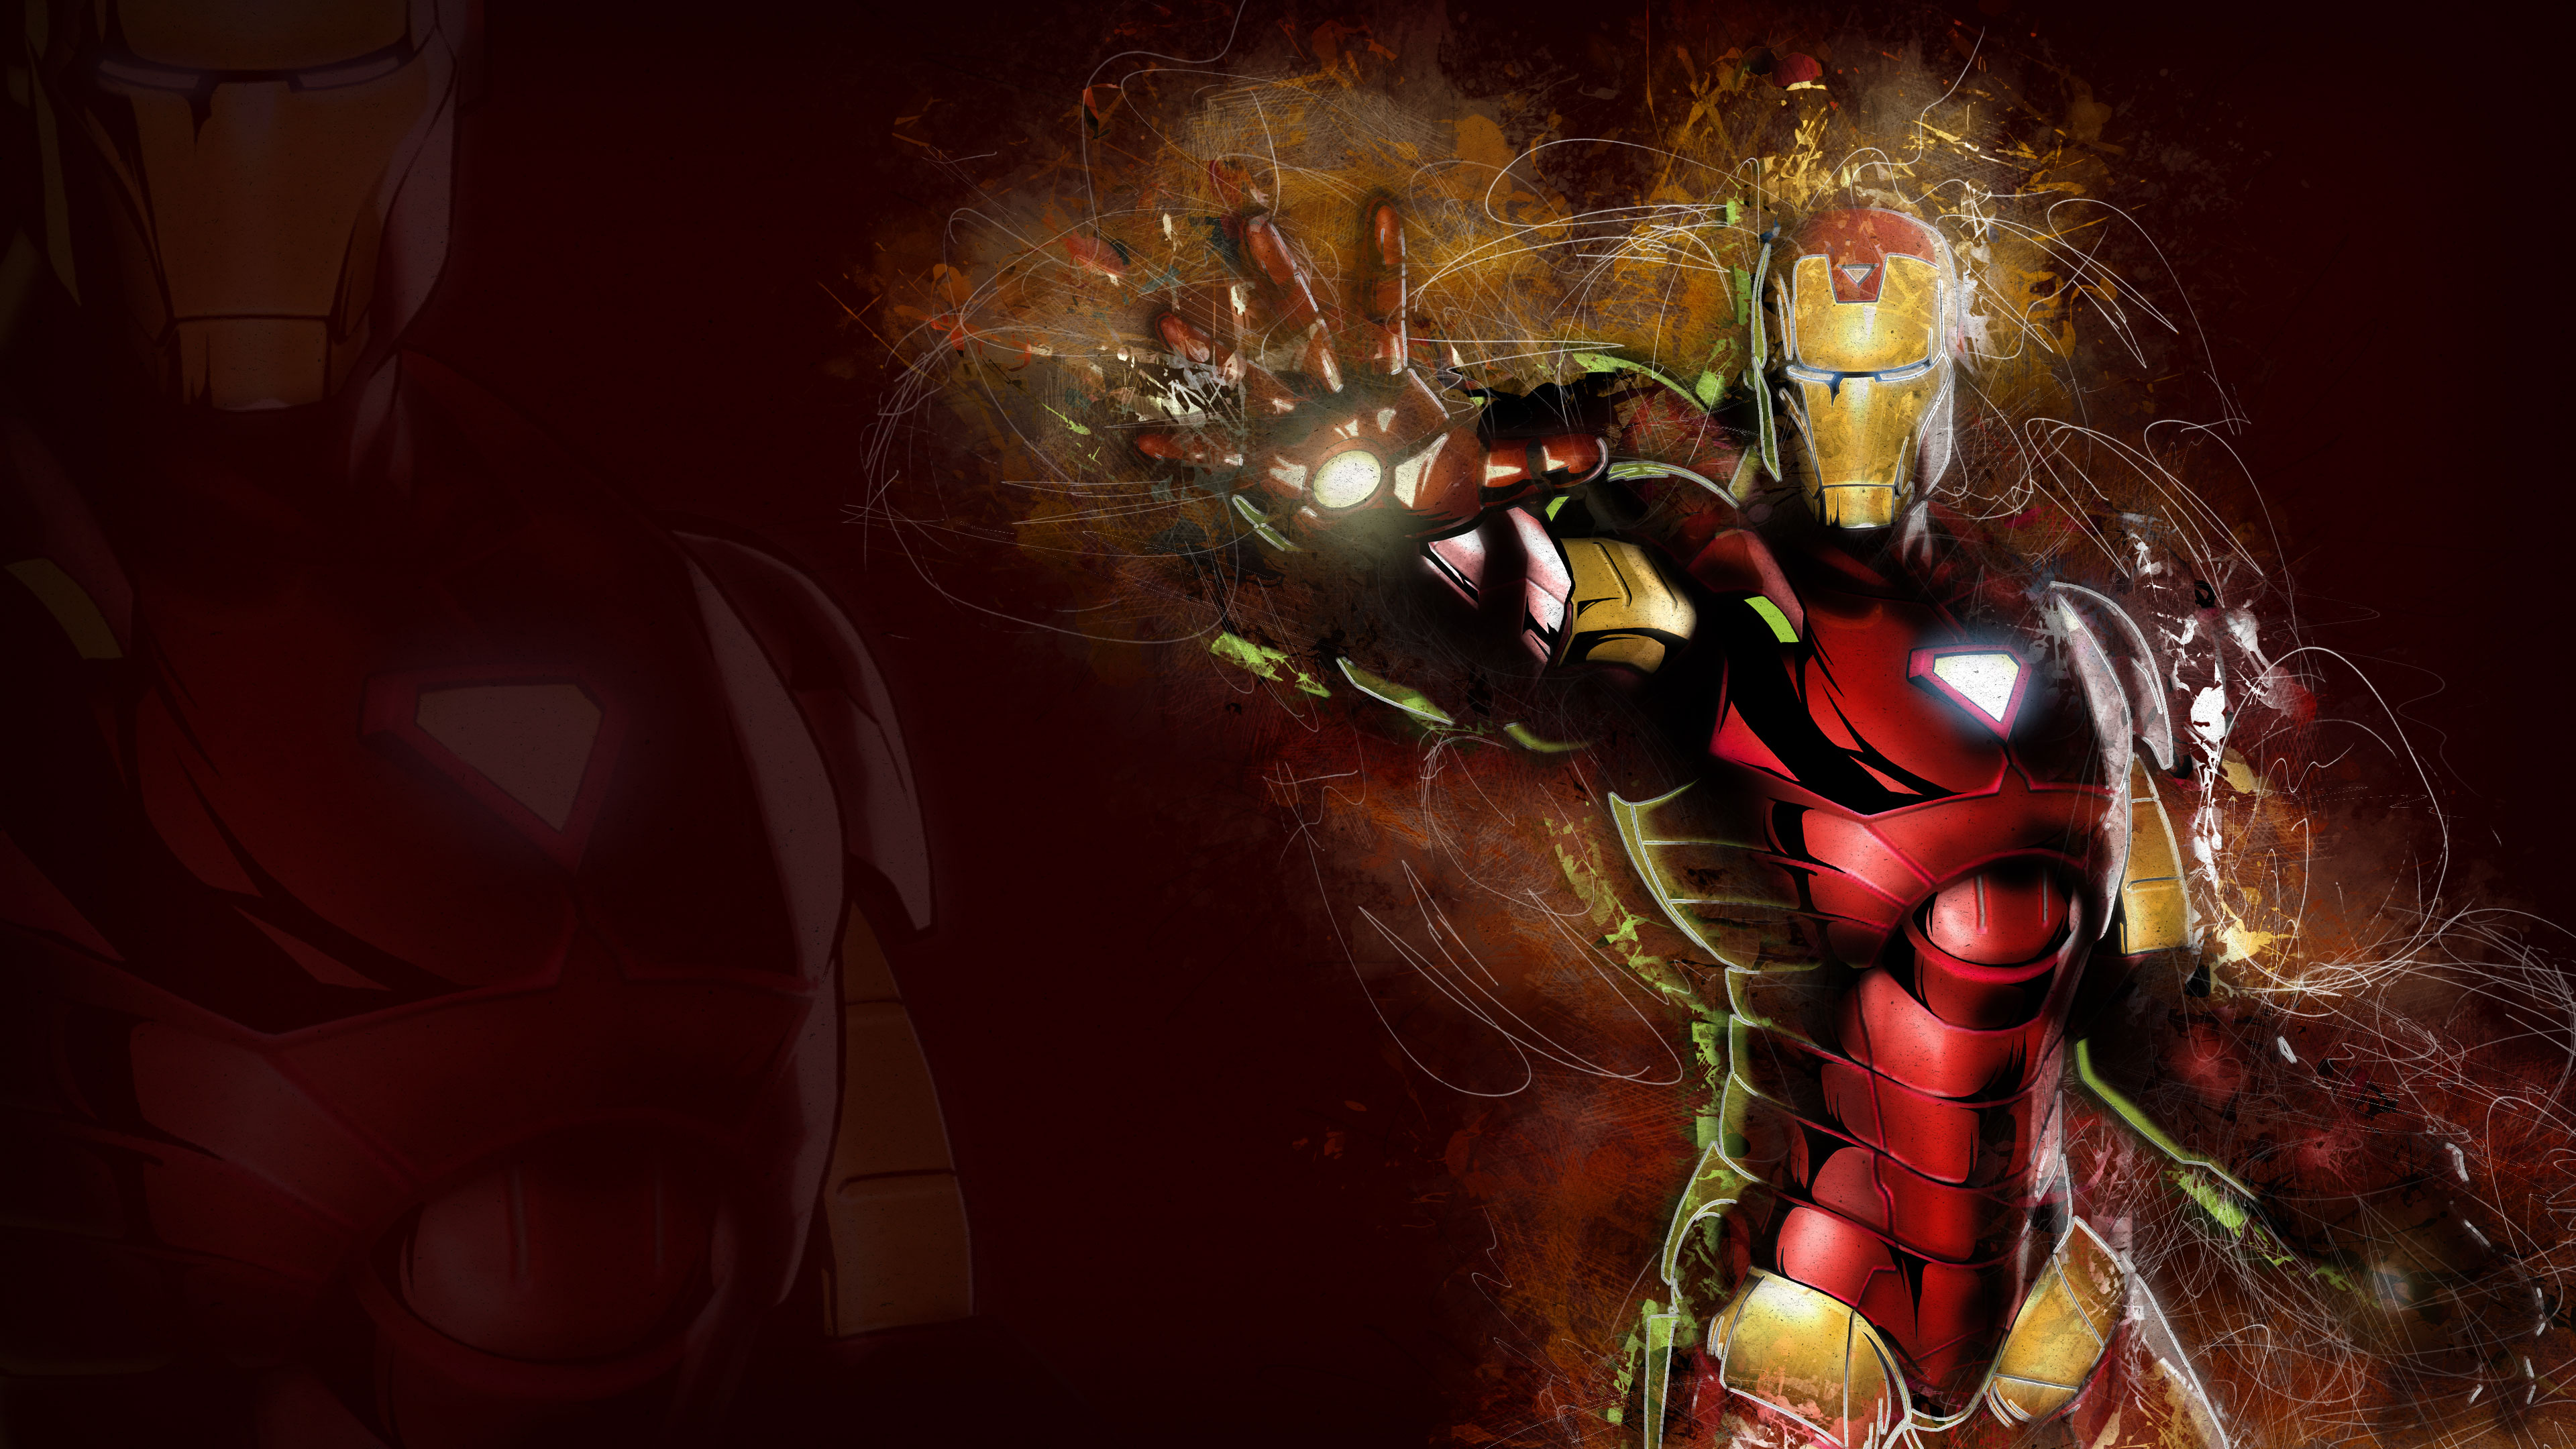 iron man art 4k 1536521843 - Iron Man Art 4k - superheroes wallpapers, iron man wallpapers, hd-wallpapers, digital art wallpapers, artwork wallpapers, art wallpapers, 4k-wallpapers